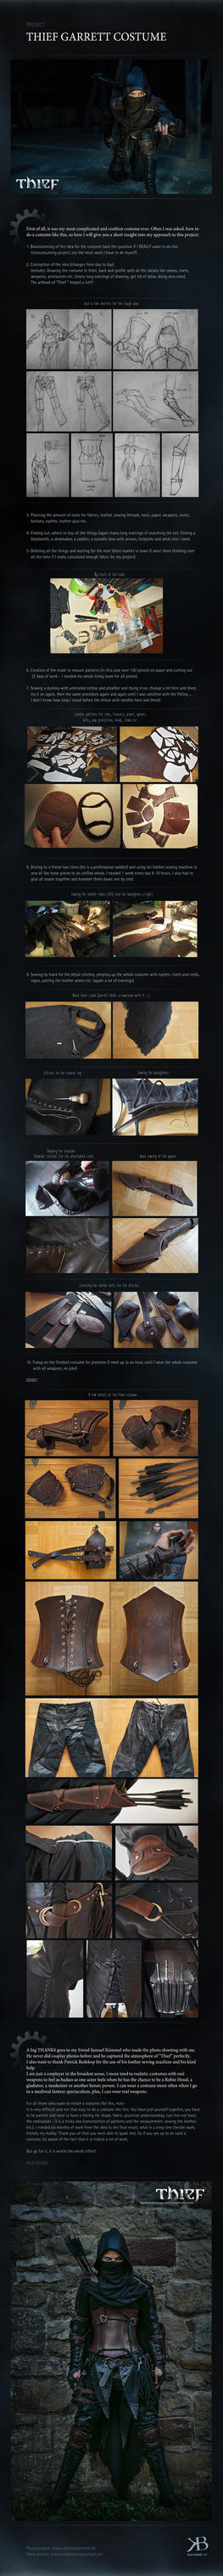 Thief 4 - Costume Process Tutorial by KejaBlank